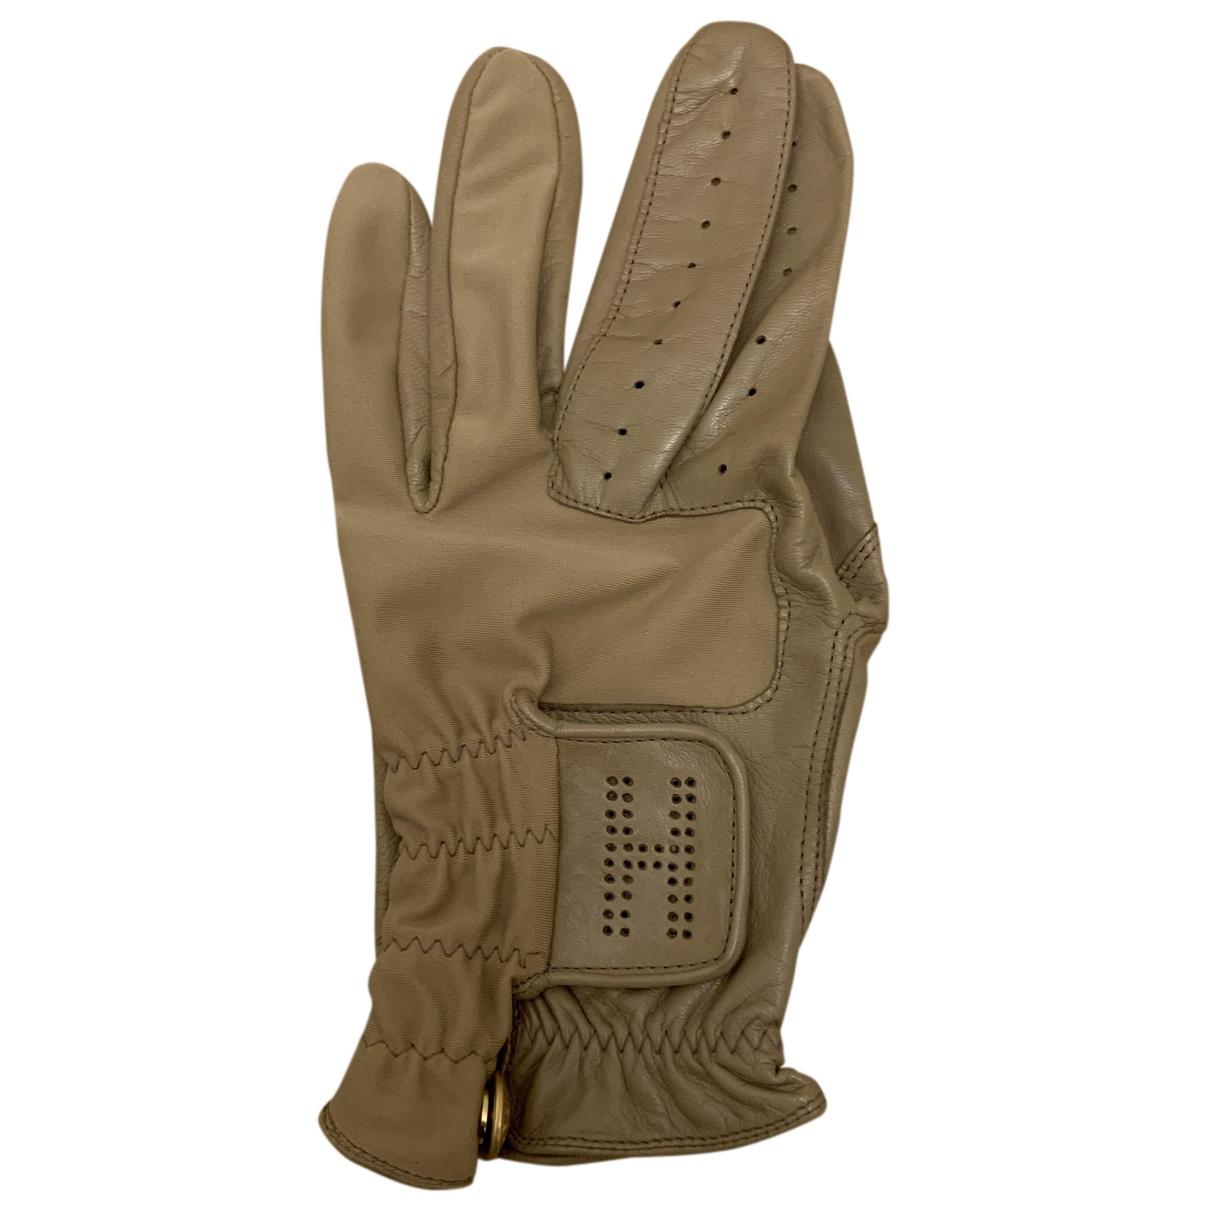 Hermes \N Handschuhe in  Beige Leder